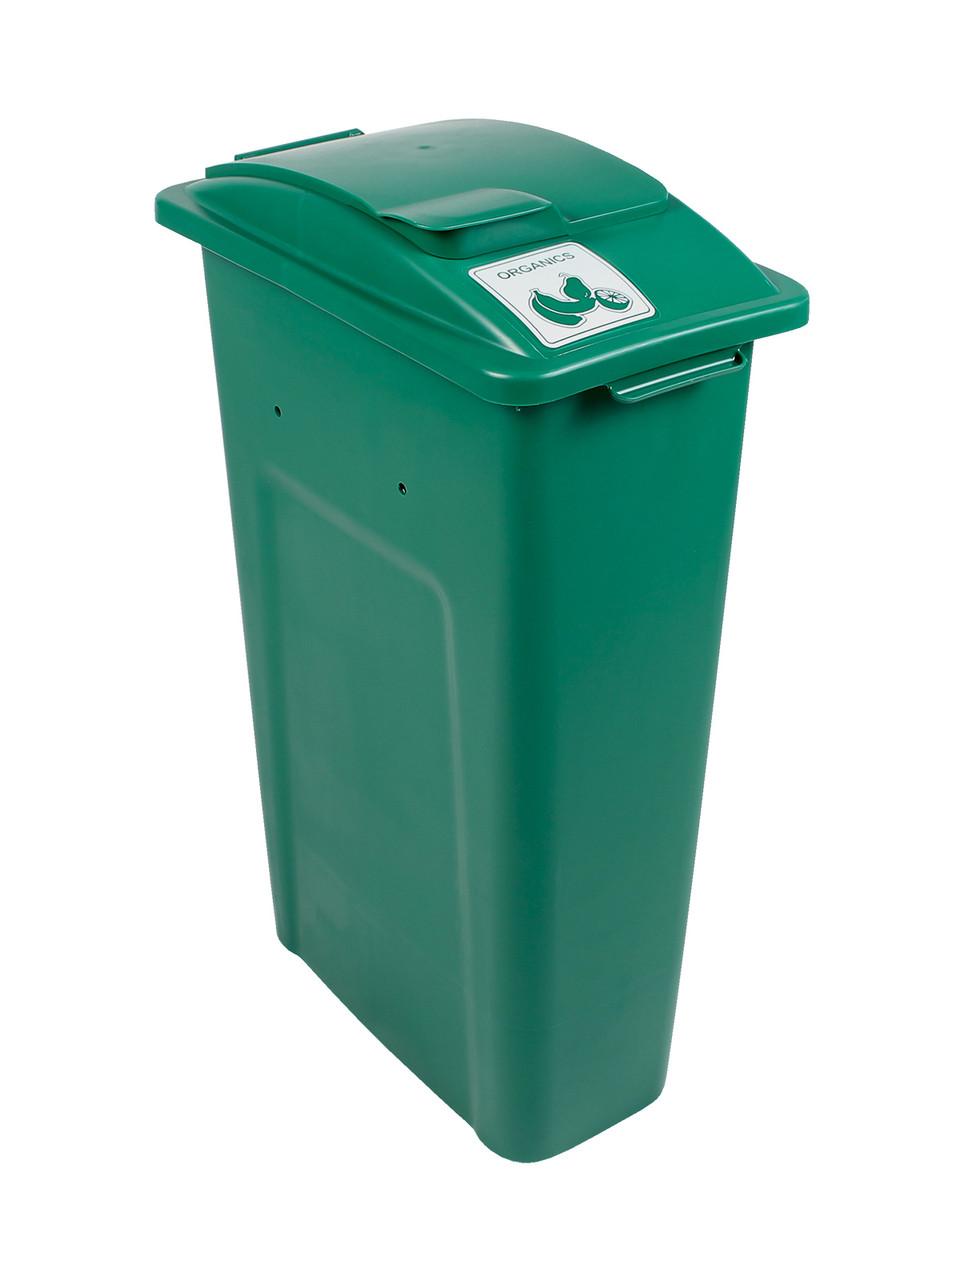 23 Gallon Green Skinny Simple Sort Compost Bin (Organics, Lift Top)